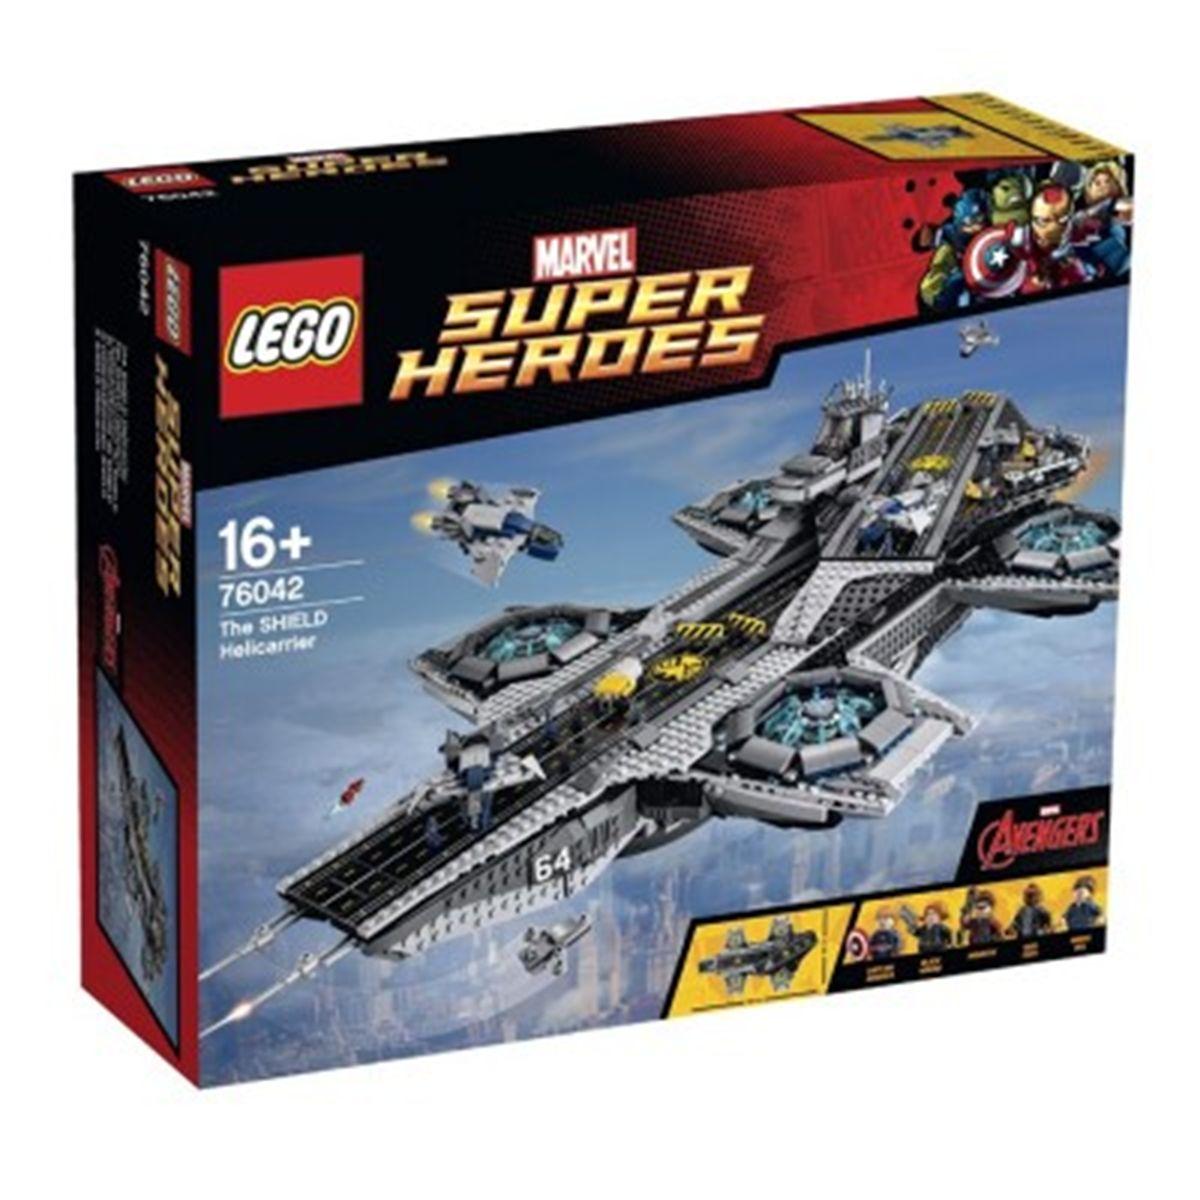 Shield Heroes 76042 Du Avengers L'hélitransport Lego Super Marvel W9EIDHYe2